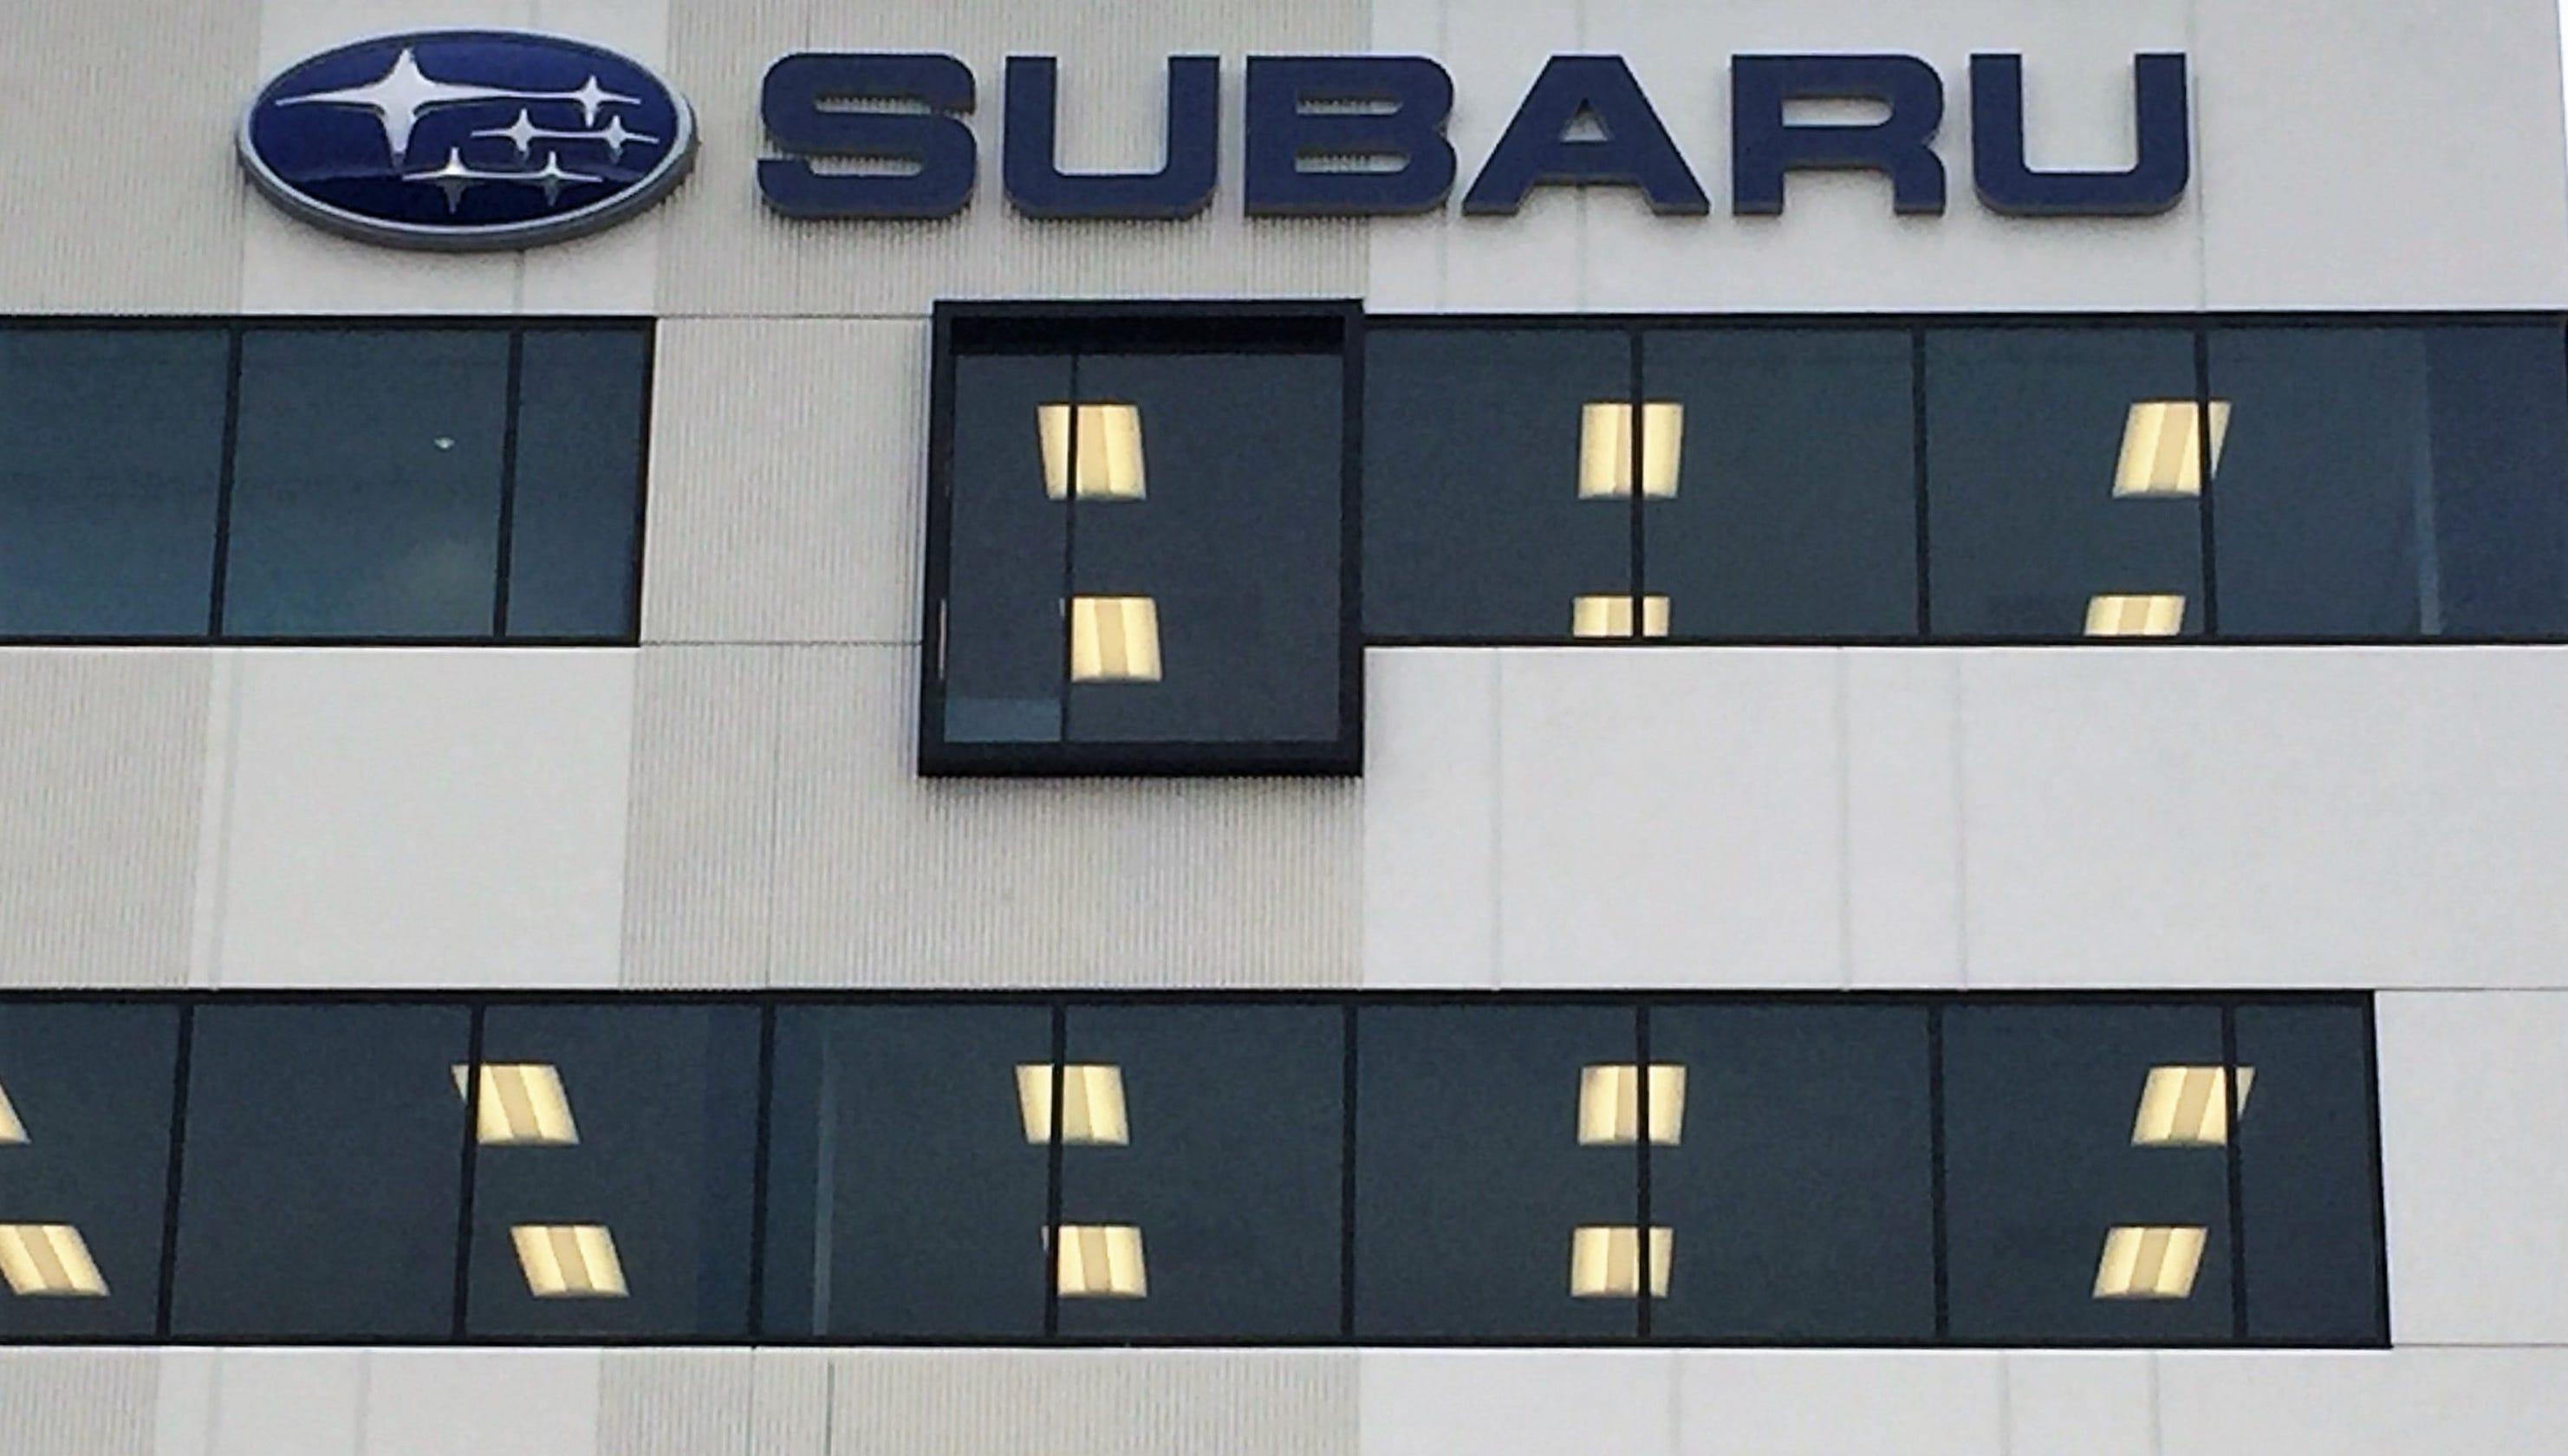 Subaru lawsuit: Proposed settlement over Subaru WRX and STi